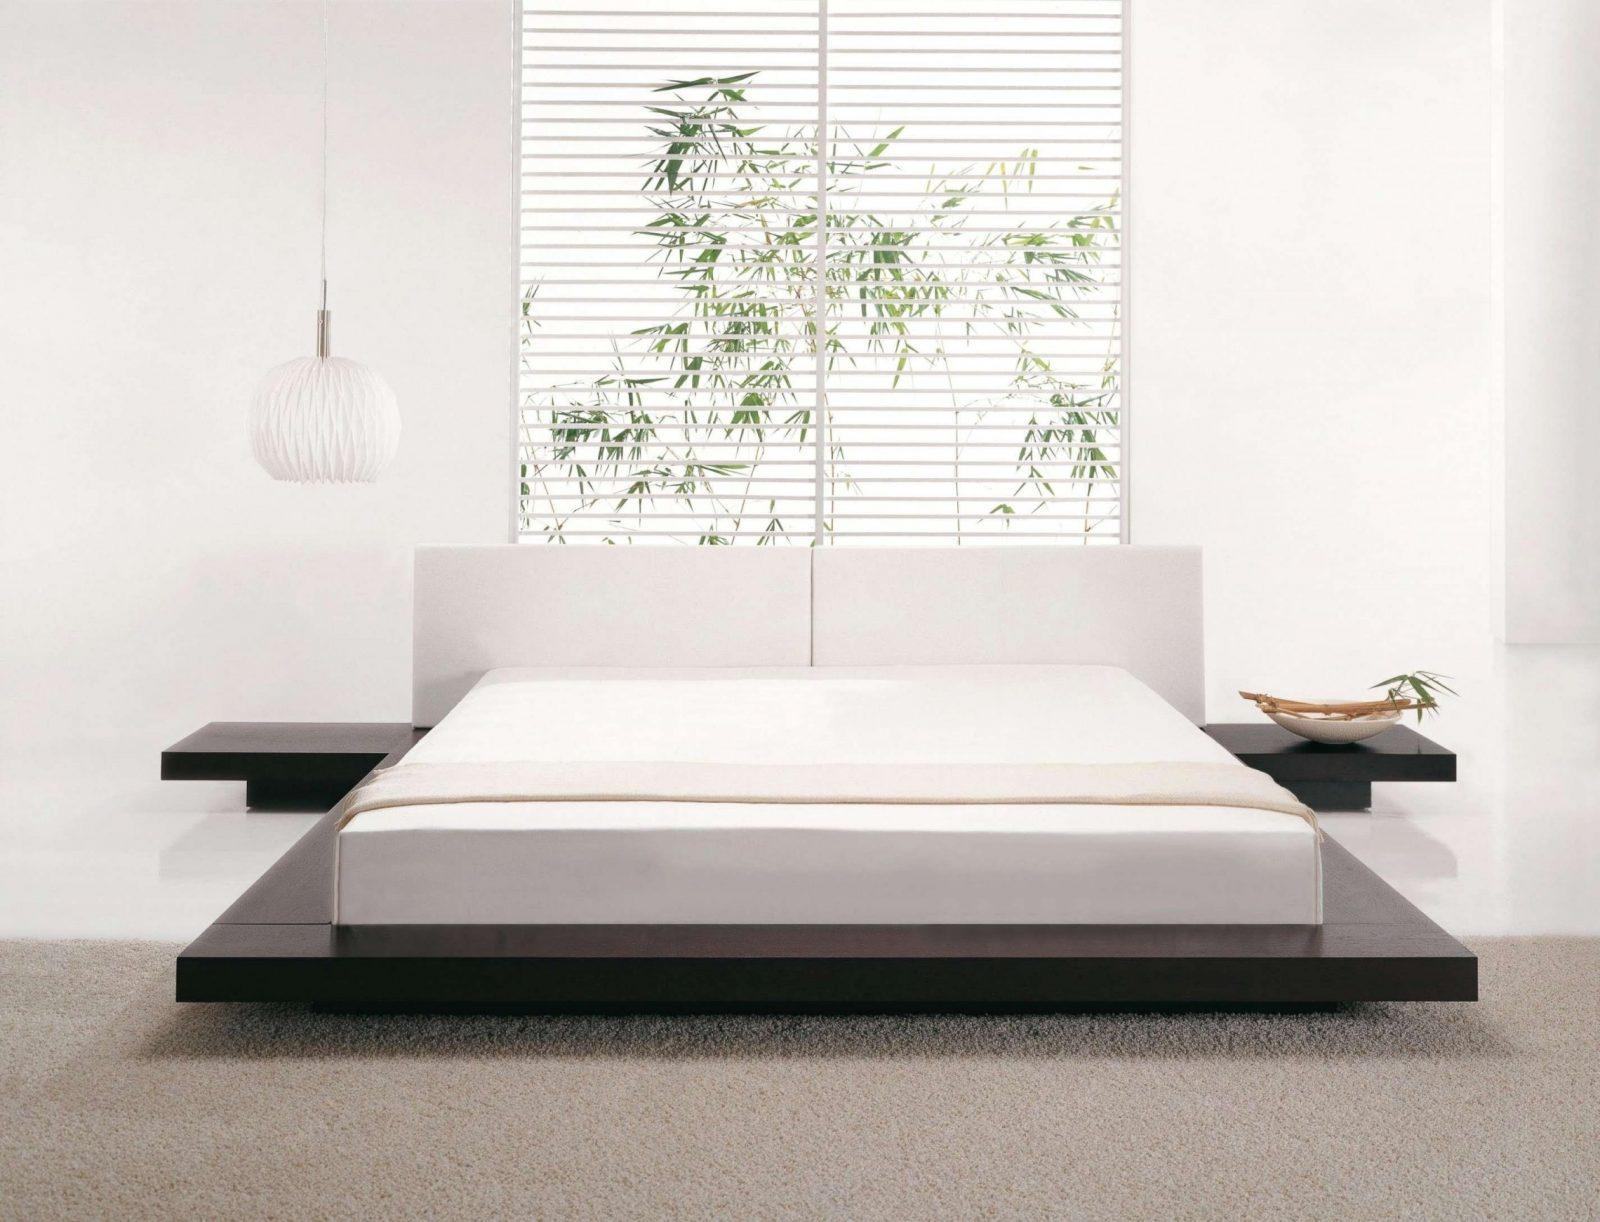 Scheidingswand Ikea Fresh Schlaf Bett Ikea Elegant Bett Selber Bauen von Bett Selber Bauen Ikea Bild